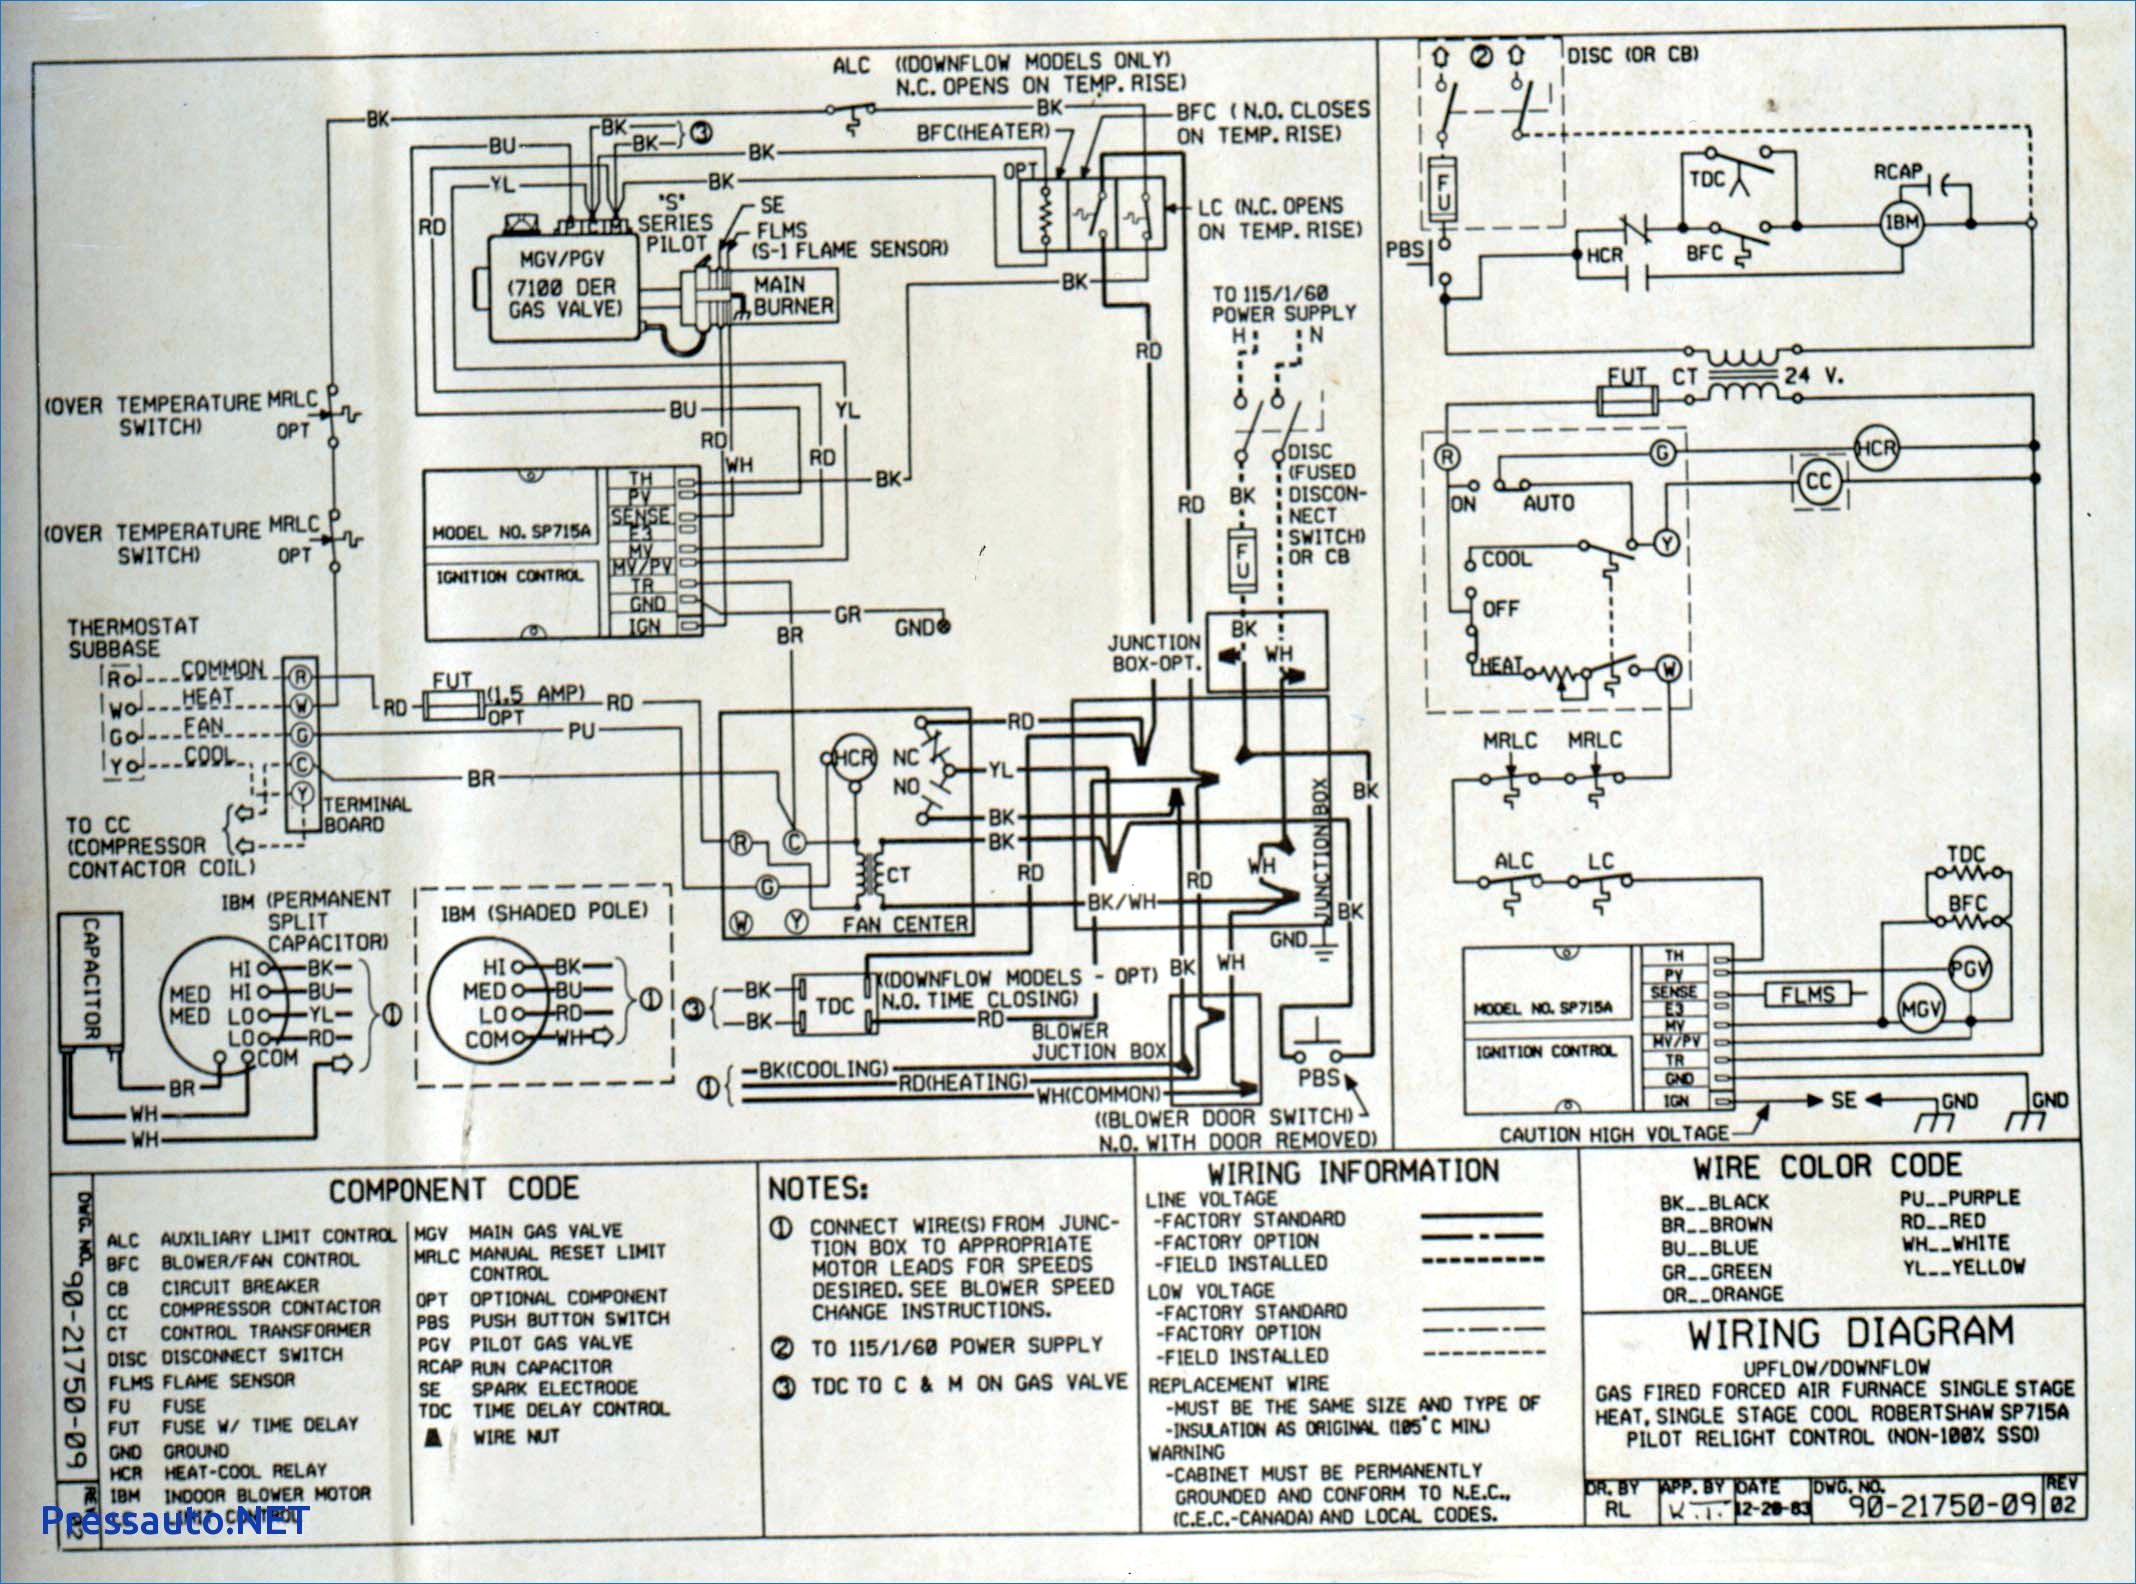 american standard furnace wiring diagram american standard furnace amana ac wiring diagram american standard furnace wiring diagram american standard furnace wiring diagram diagrams heat pump ac unit